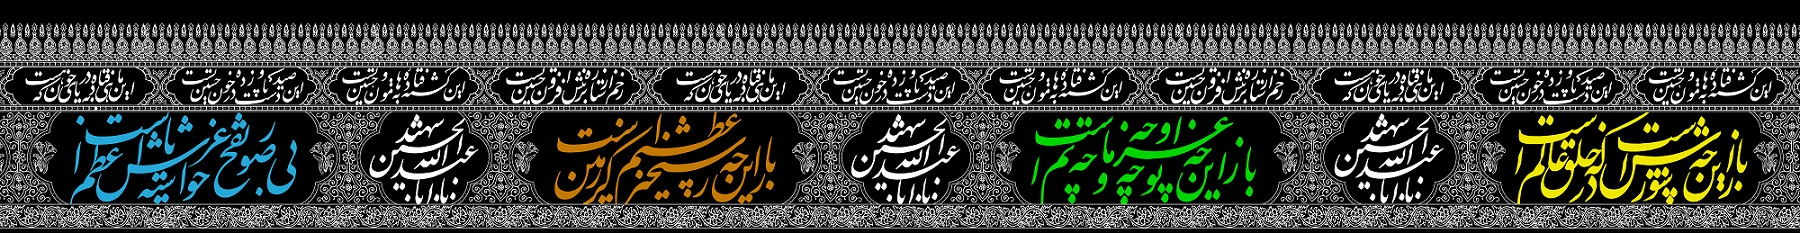 اشعار شب هشتم محرم؛ حضرت علی اصغر(ع)